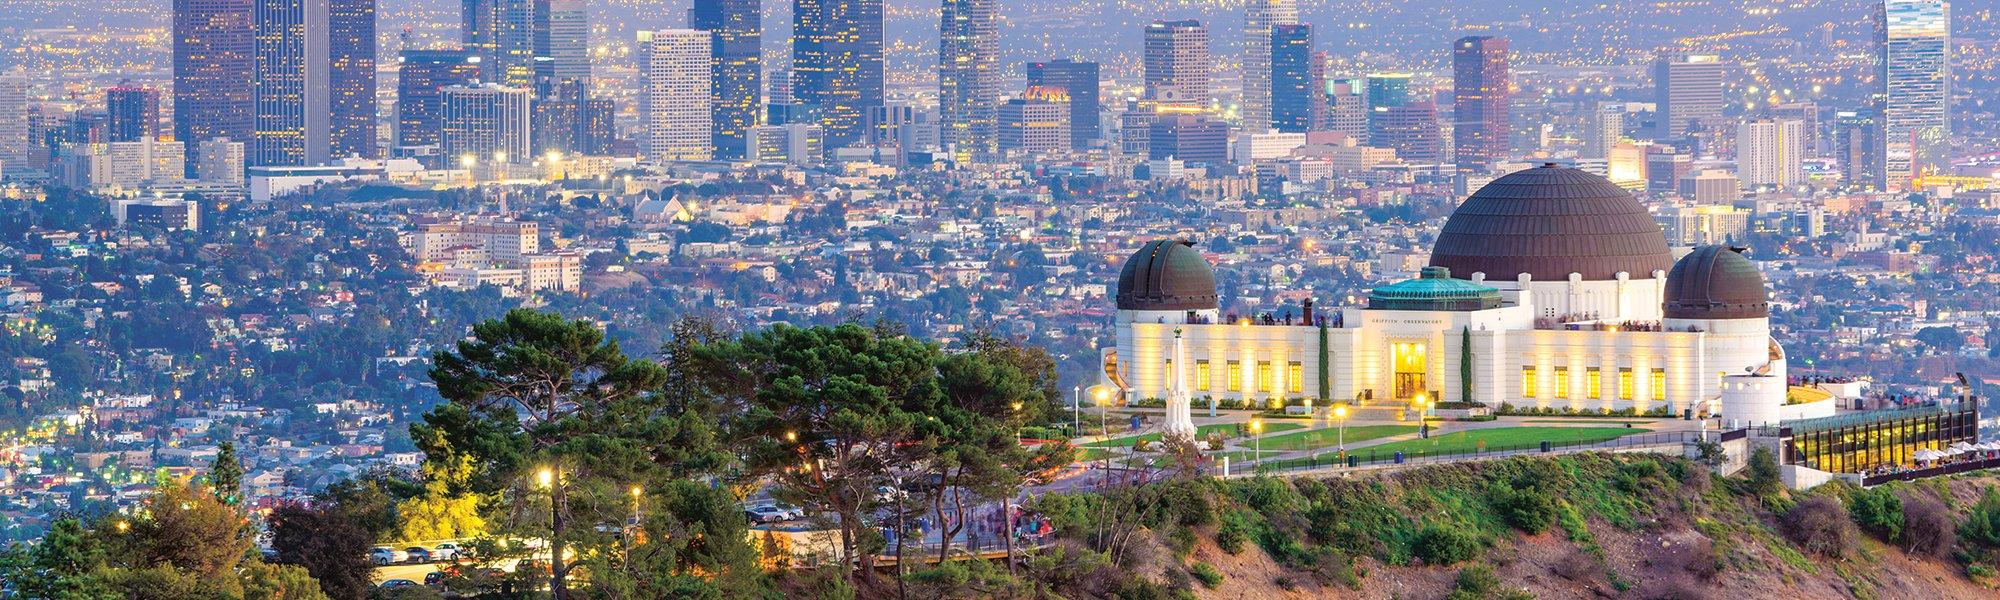 LosAngeles, California.jpg